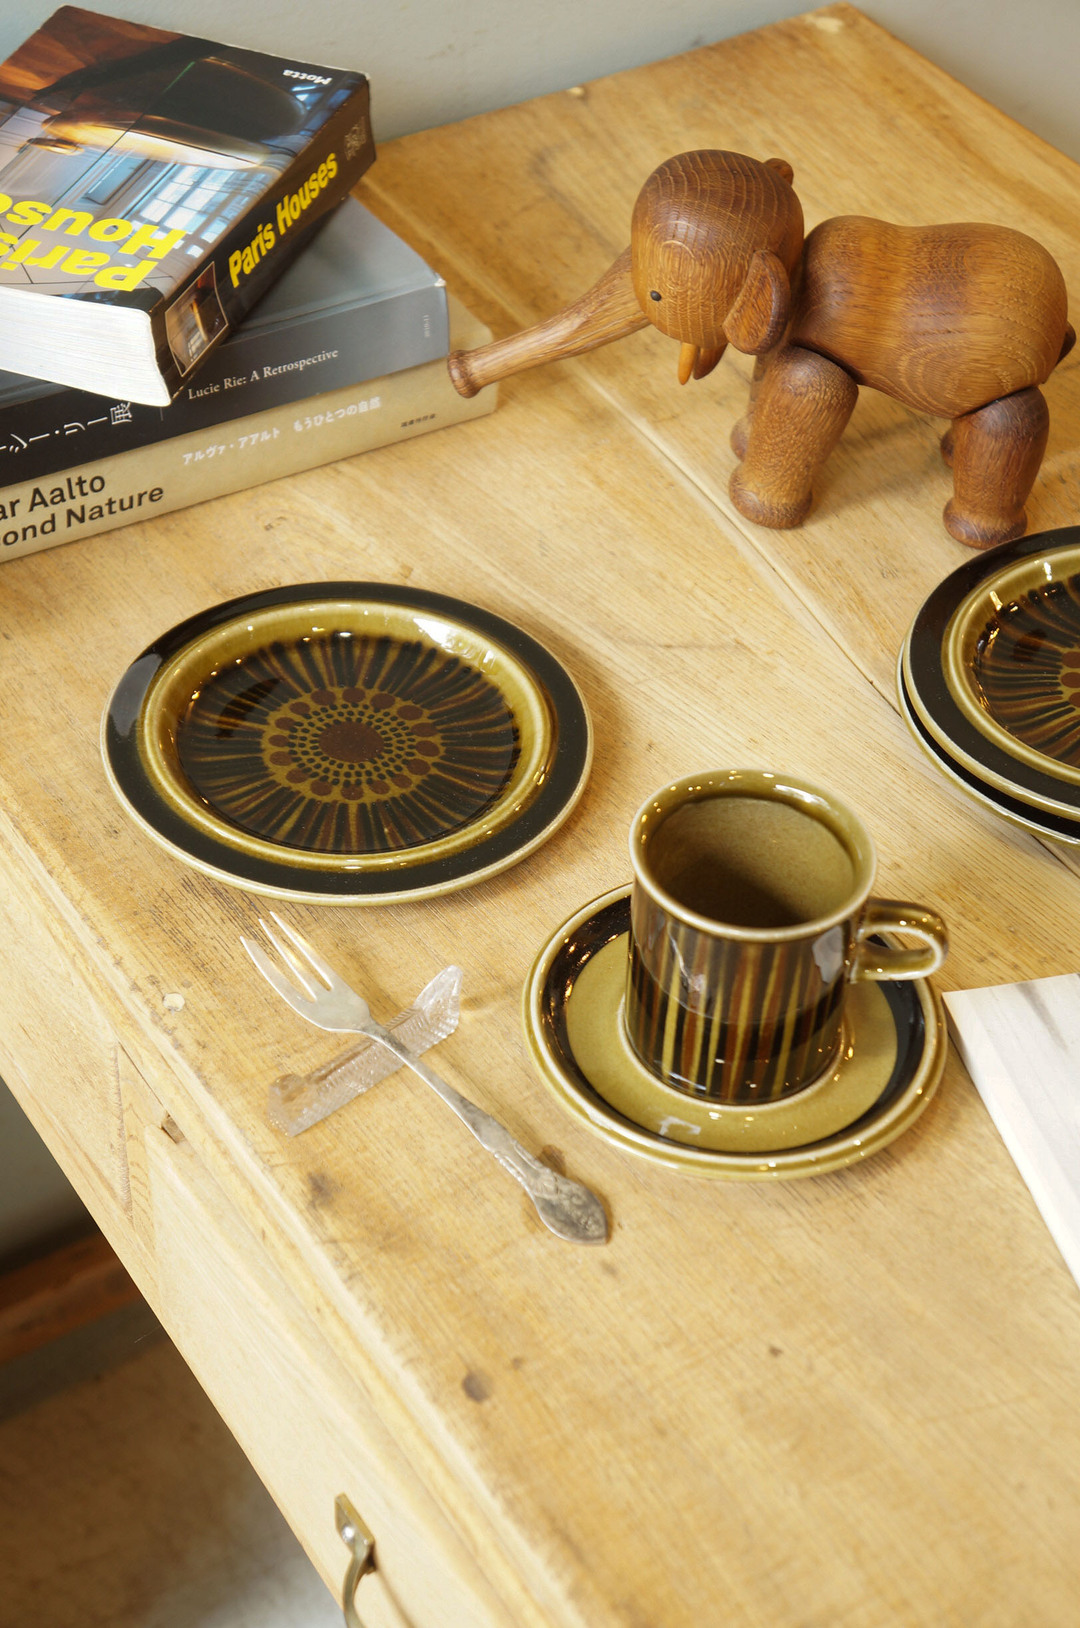 ARABIA Kosmos Plate 16cm/アラビア コスモス プレート 16cm ケーキ皿 北欧食器 フィンランドヴィンテージ